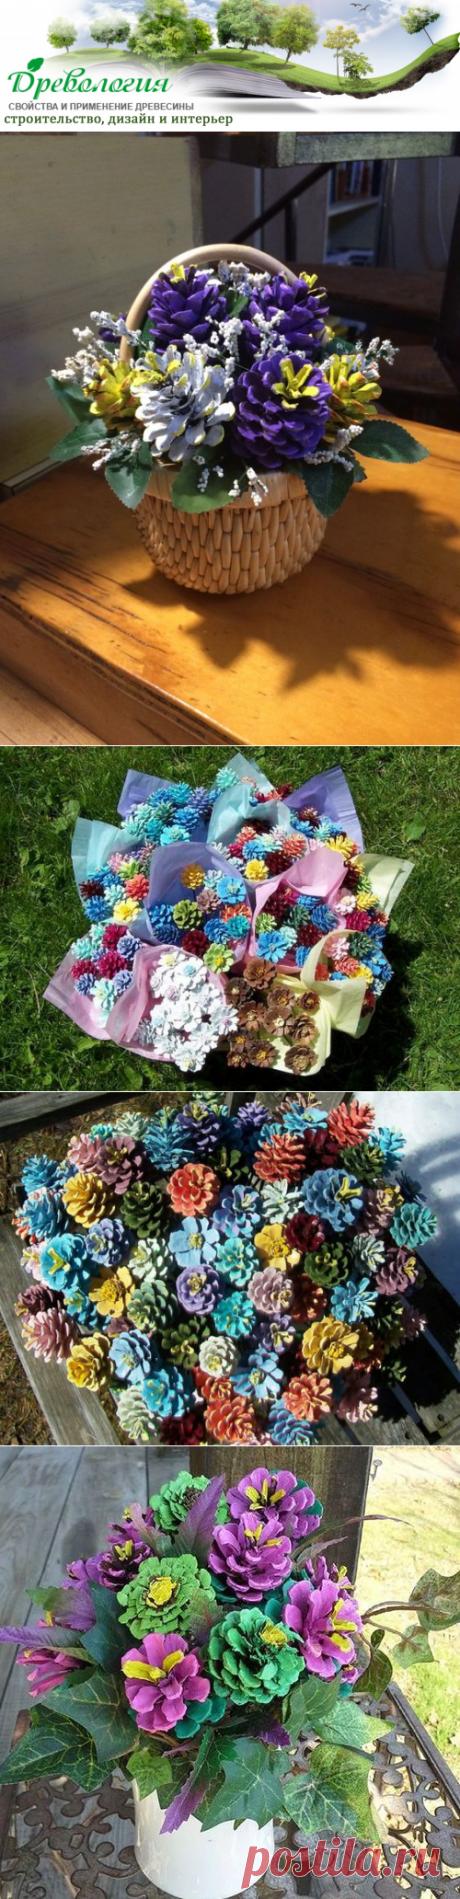 Идеи ярких букетов из шишек